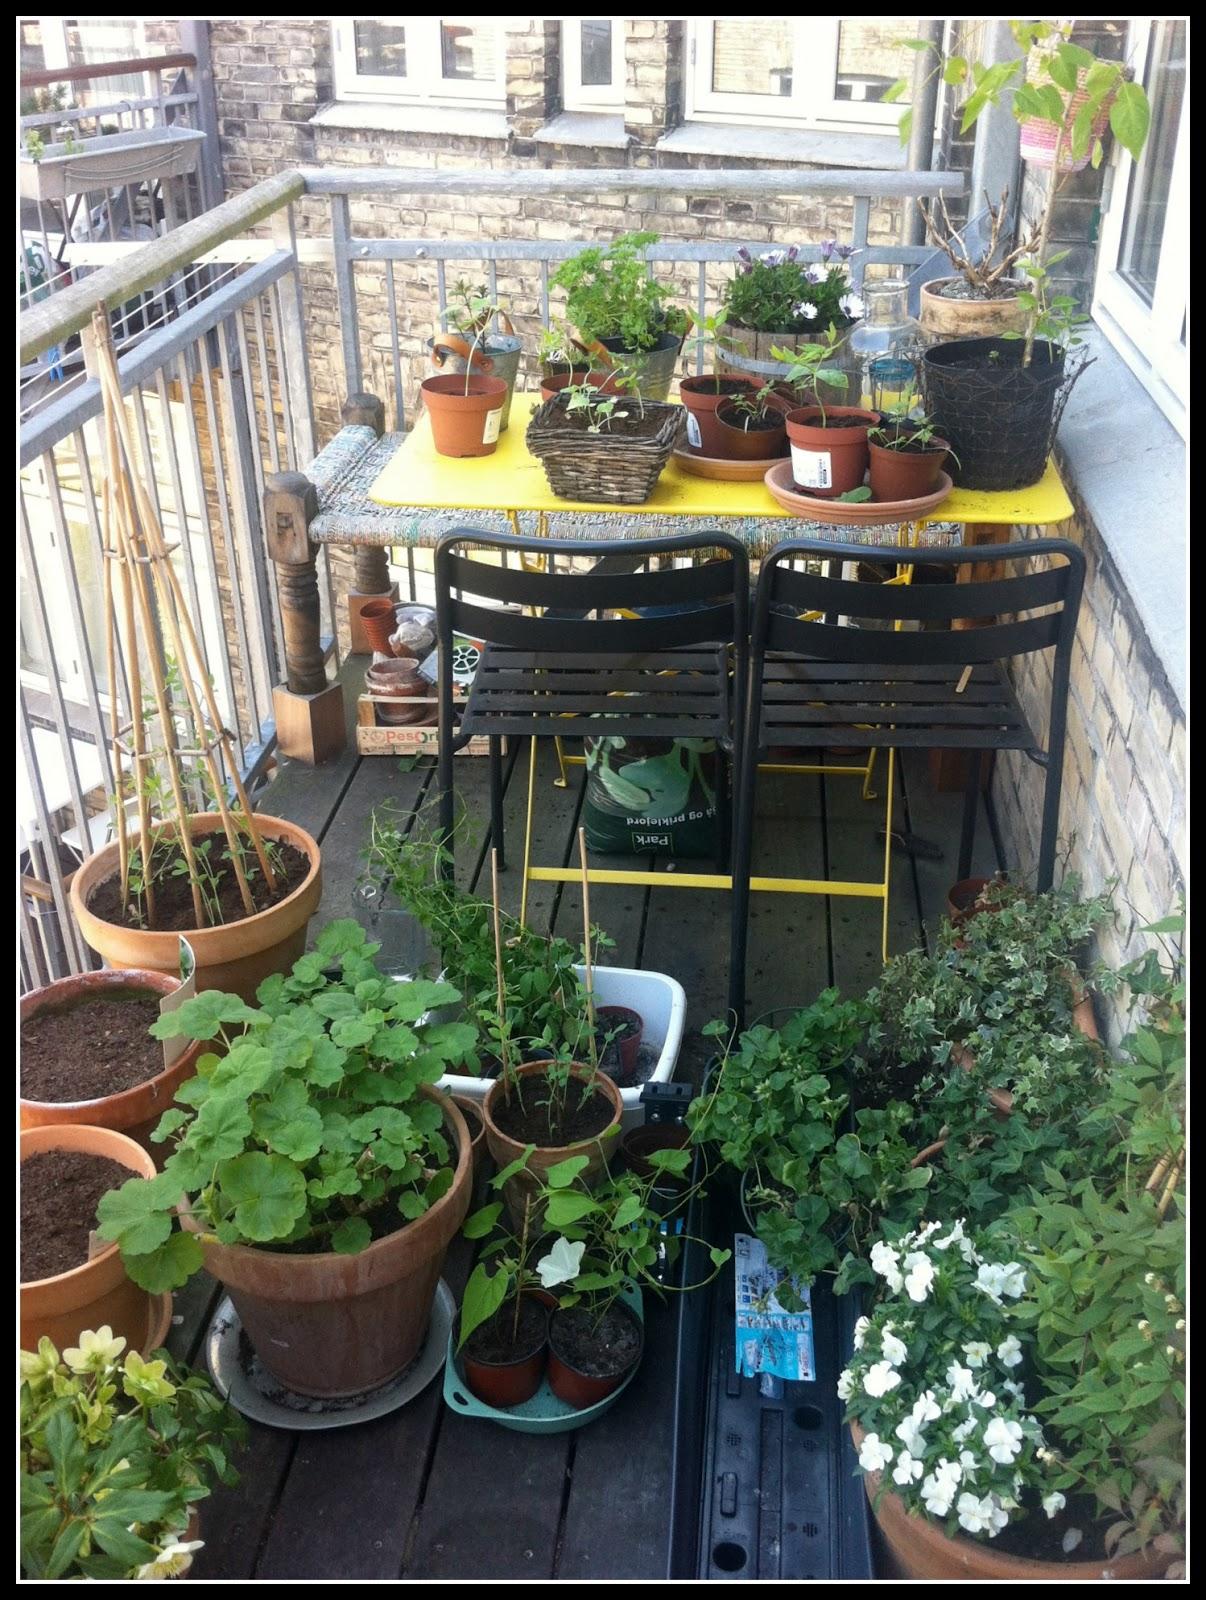 Ninas altanhave   en krukkehave midt i byen